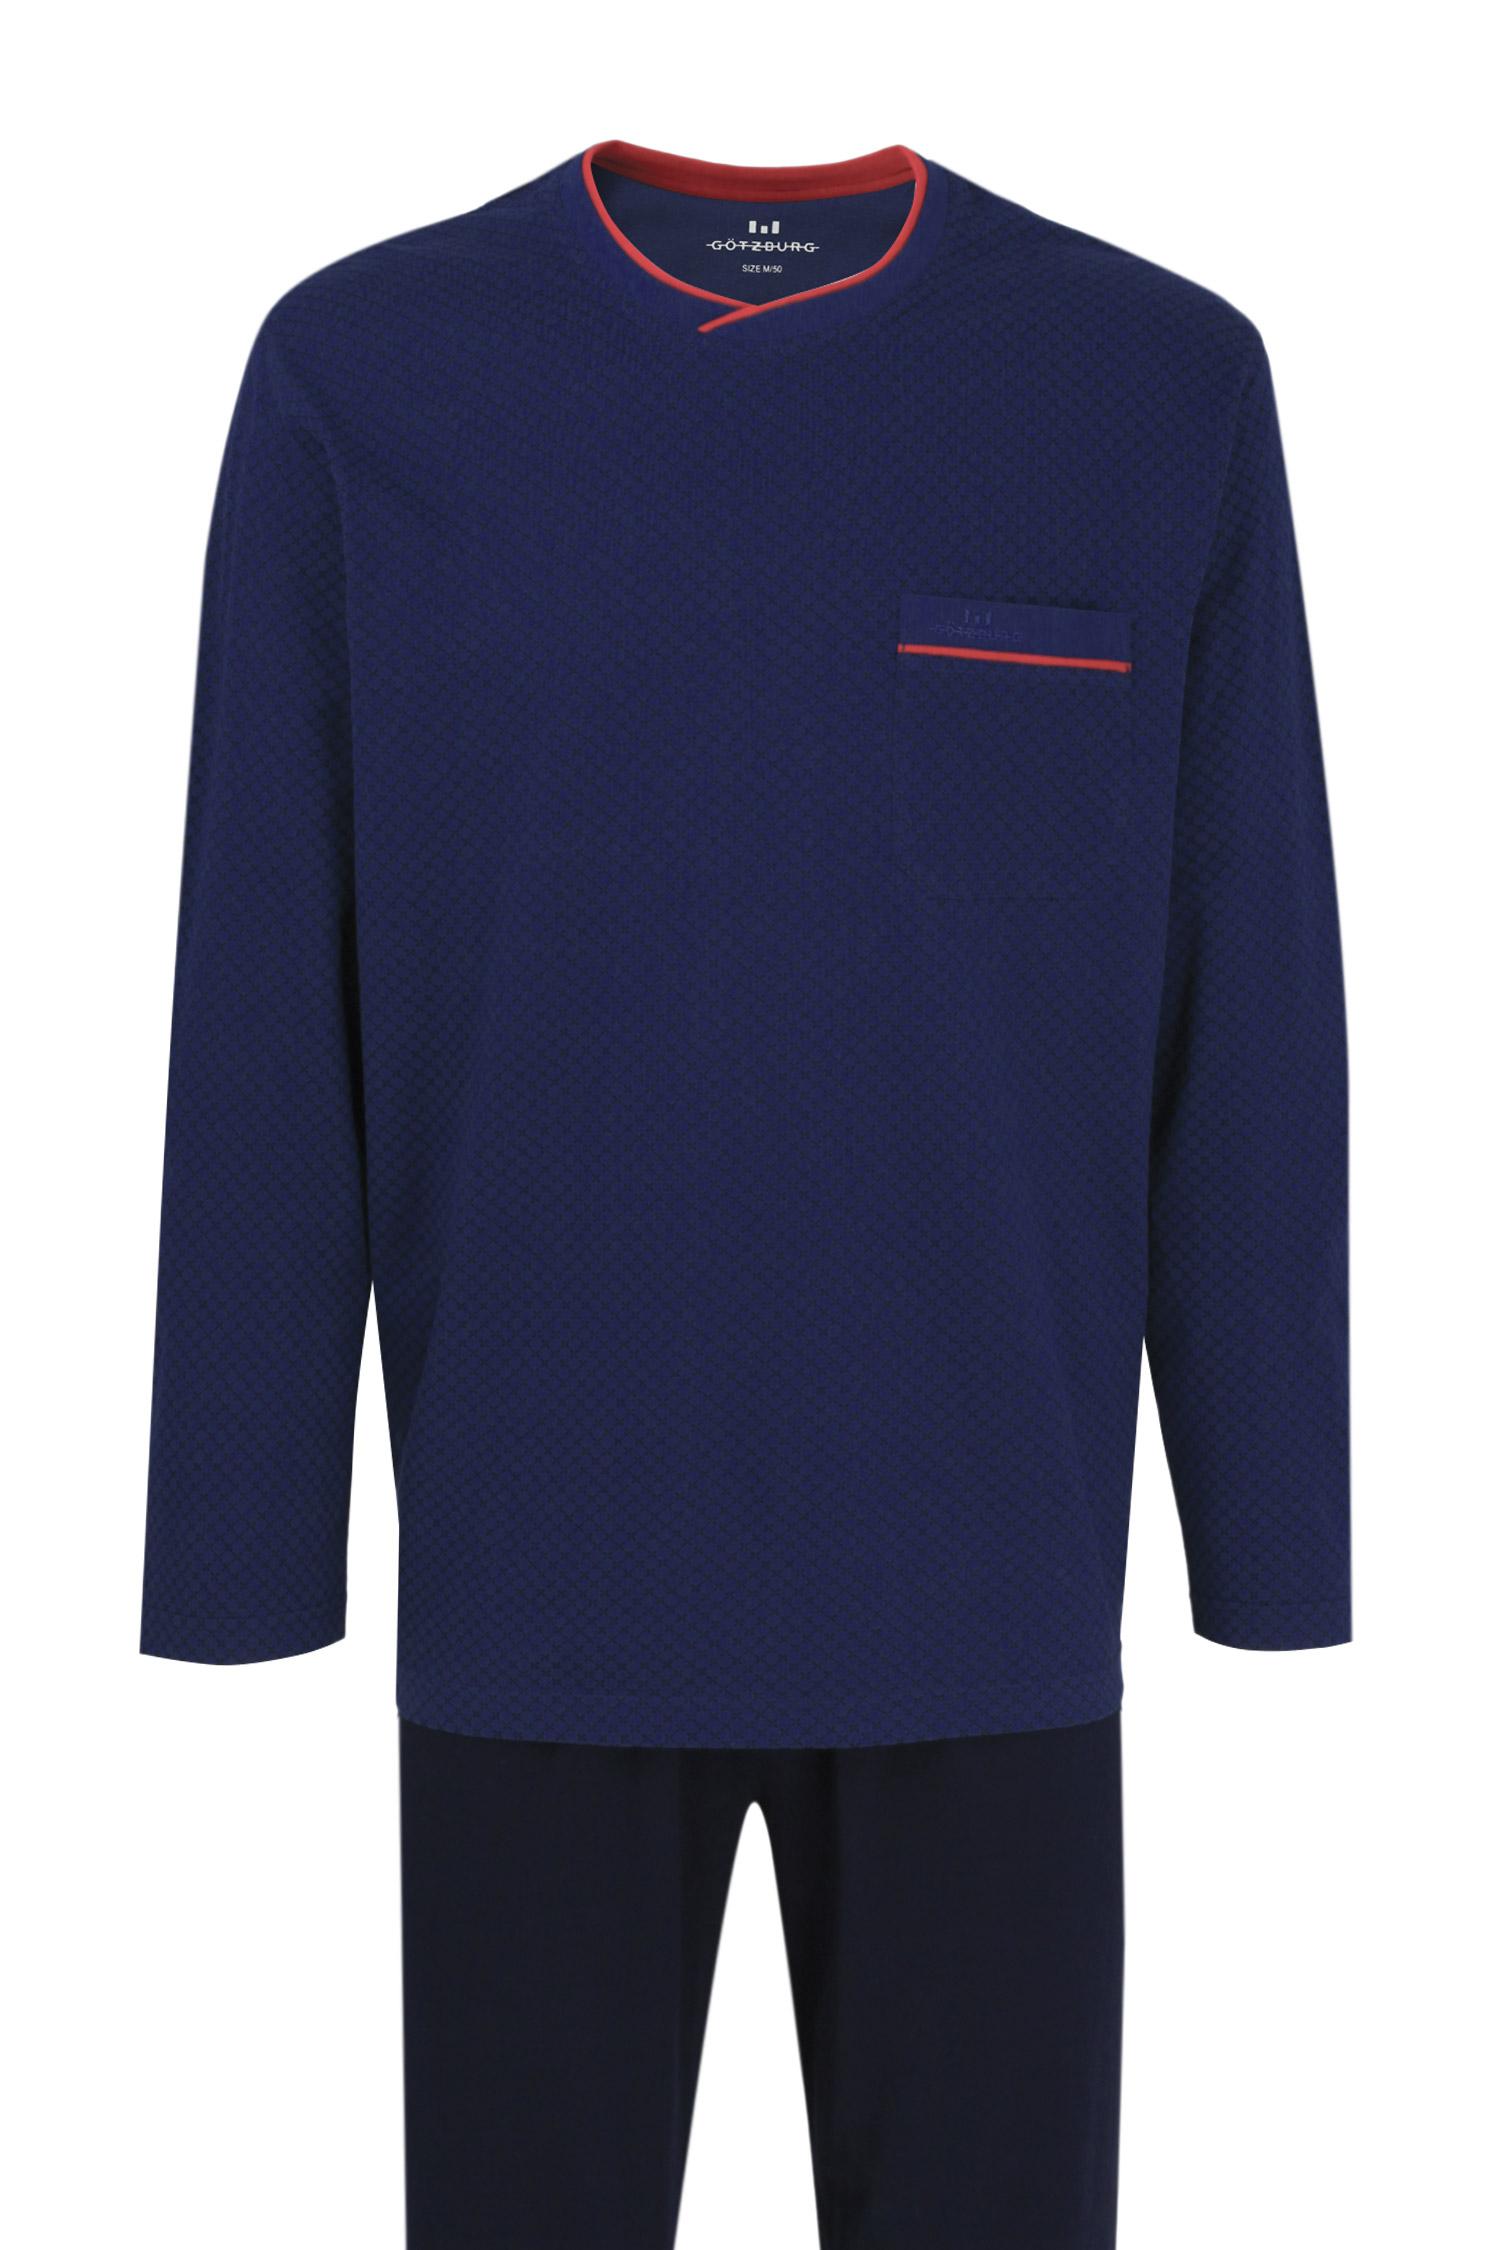 Homewear, Pijama M. Larga, 109345, MARINO | Zoom